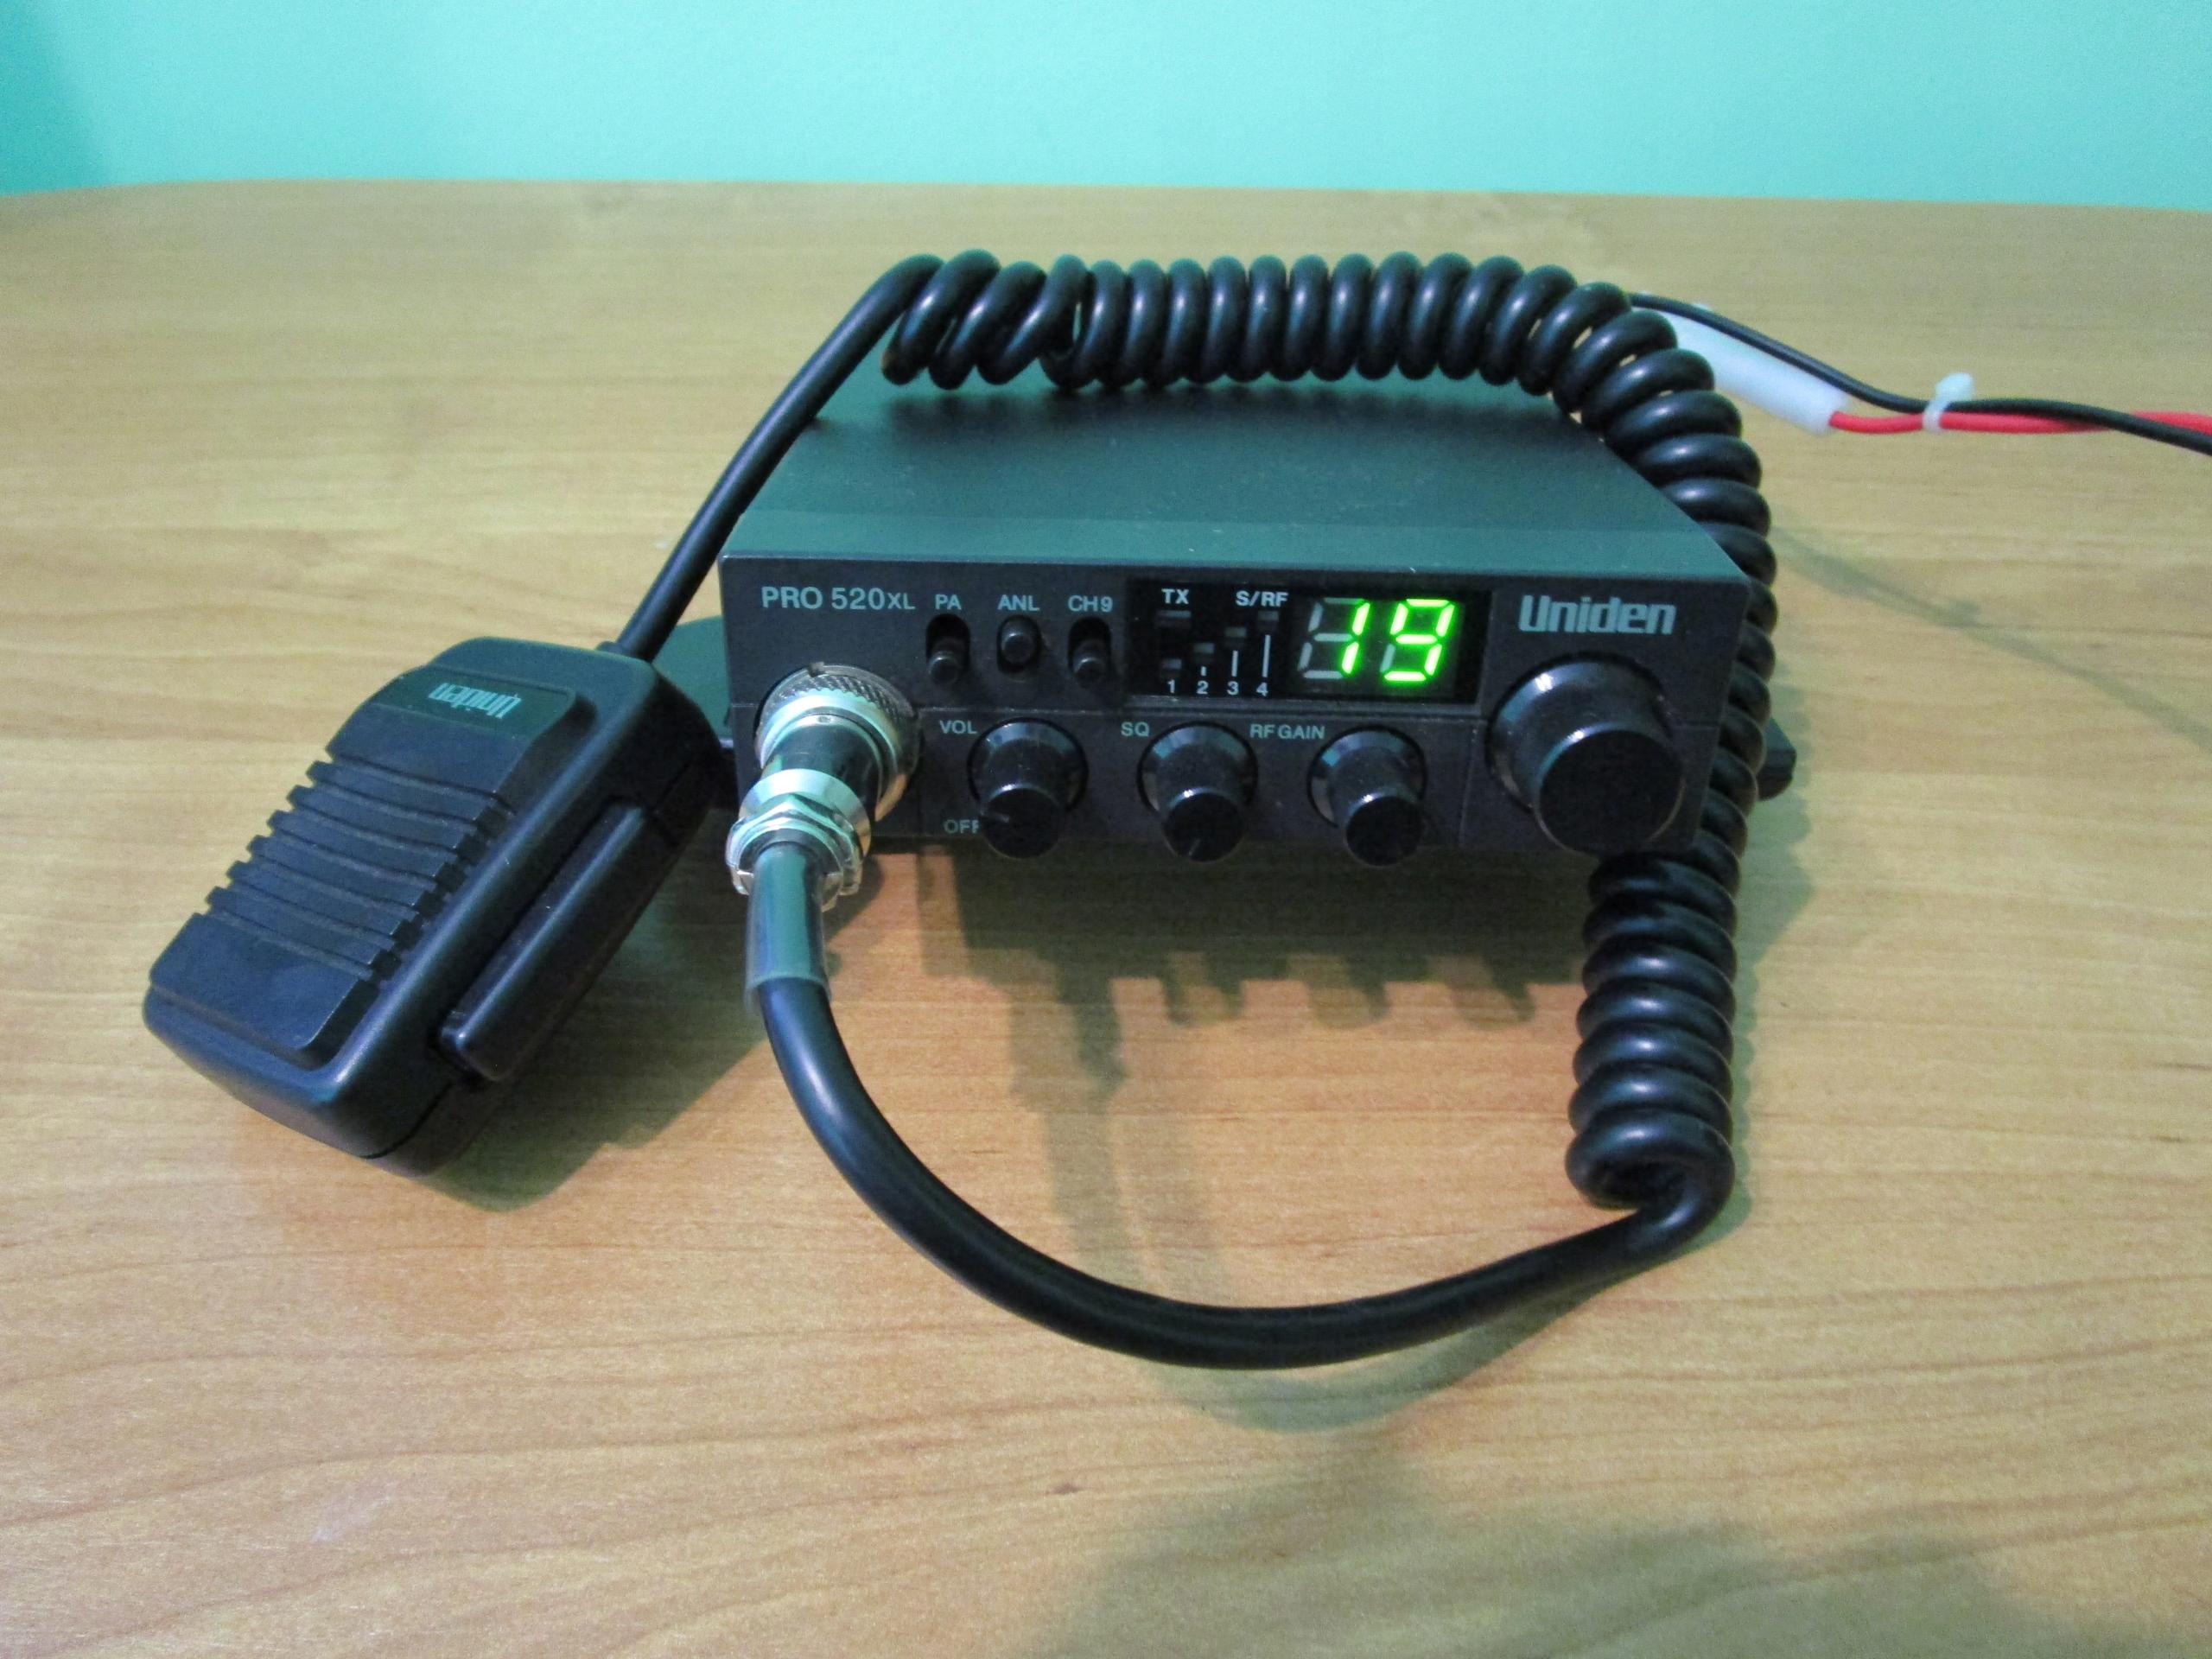 CB radio Uniden PRO 520XL,150% MOCY, No China LOOK